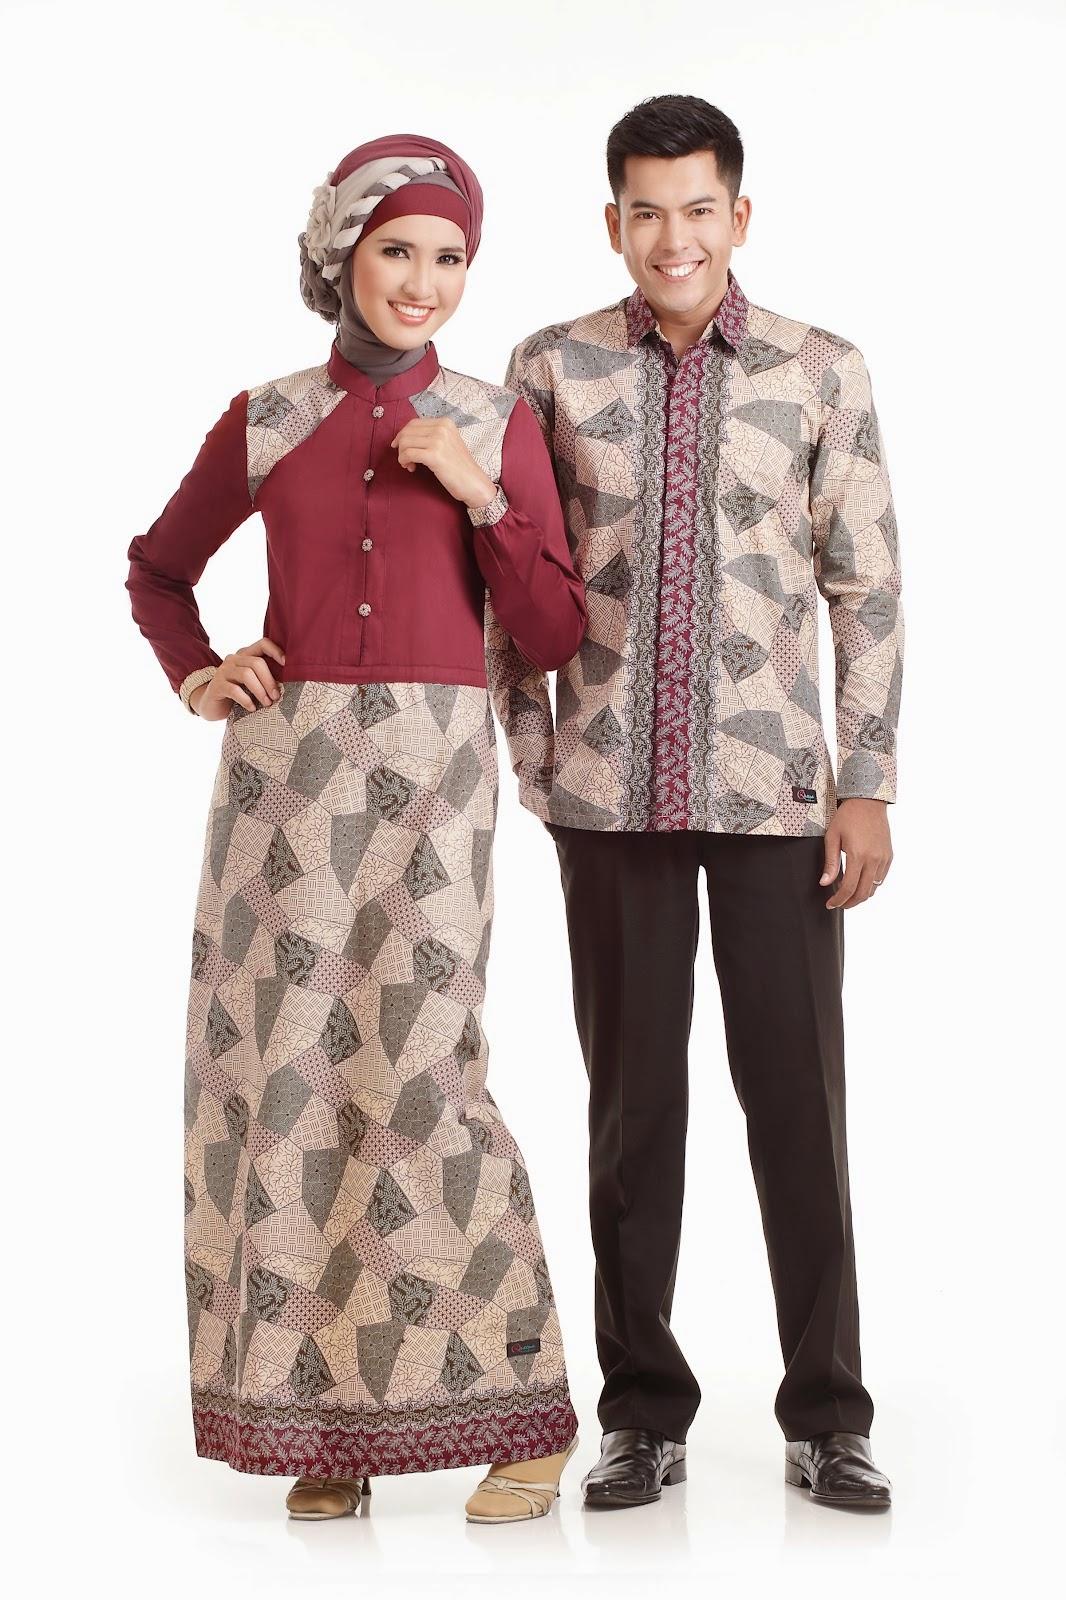 ... couple sekeluarga batik model baju Model pesta modern pendek baju  muslim terbaru lengan ... 7c201ba5a0